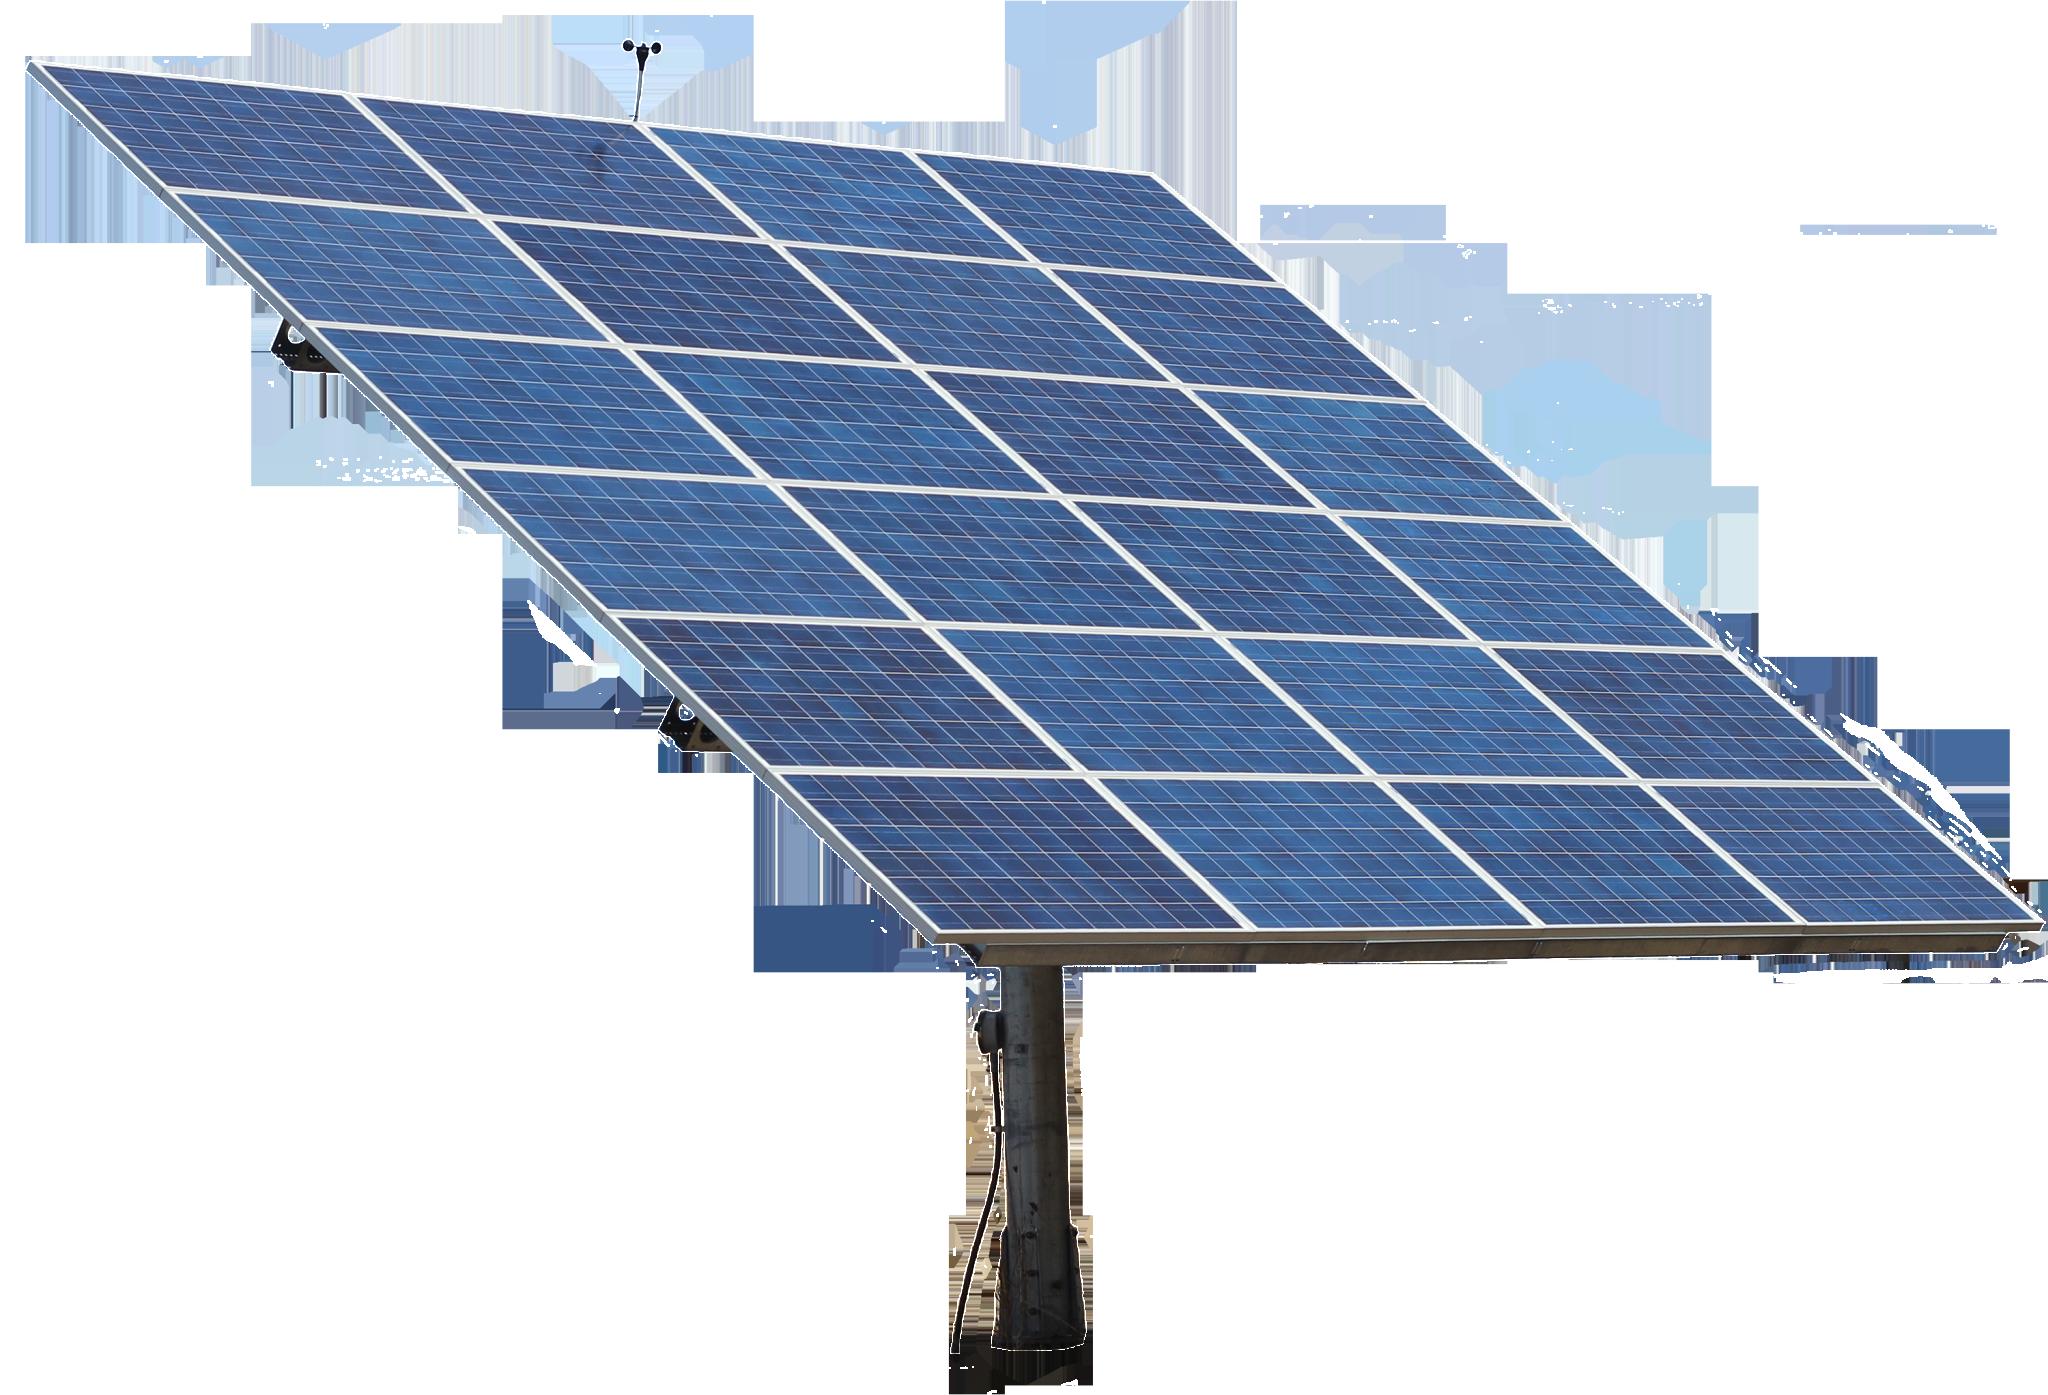 jpg freeuse Solar Panels Solar power Photovoltaic system Solar energy